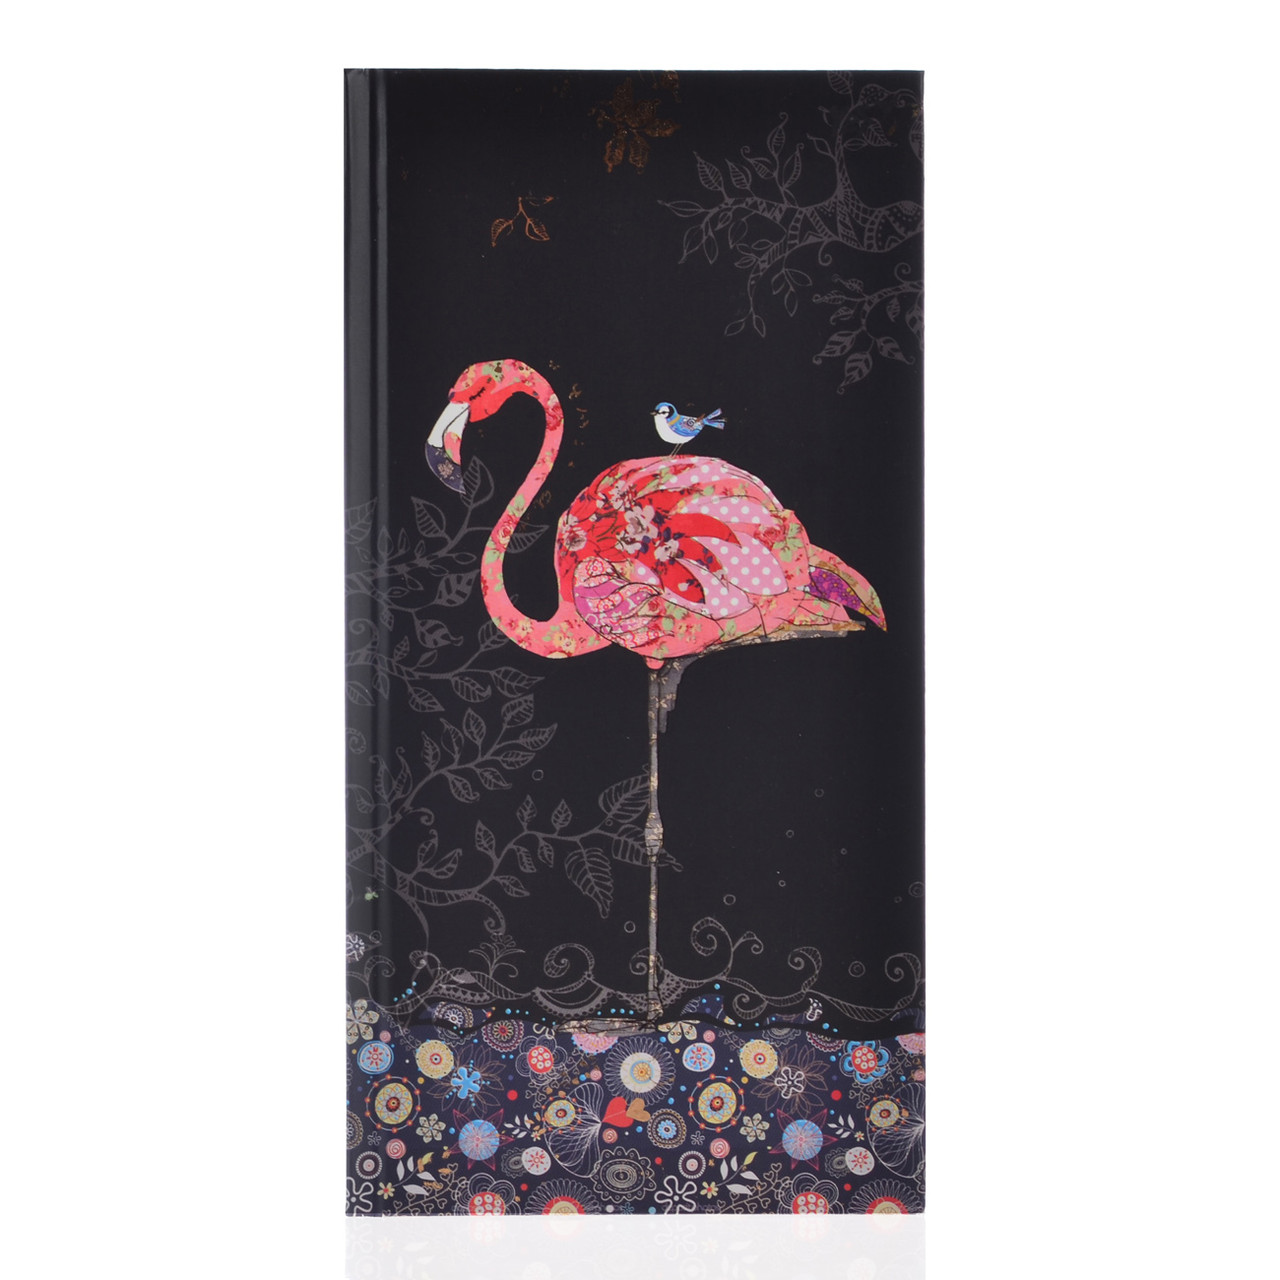 "Блокнот 100*200/64 КЛ. интег., фольга золото+Уф.выб. ""BugArt. Black flamingo"" YES"